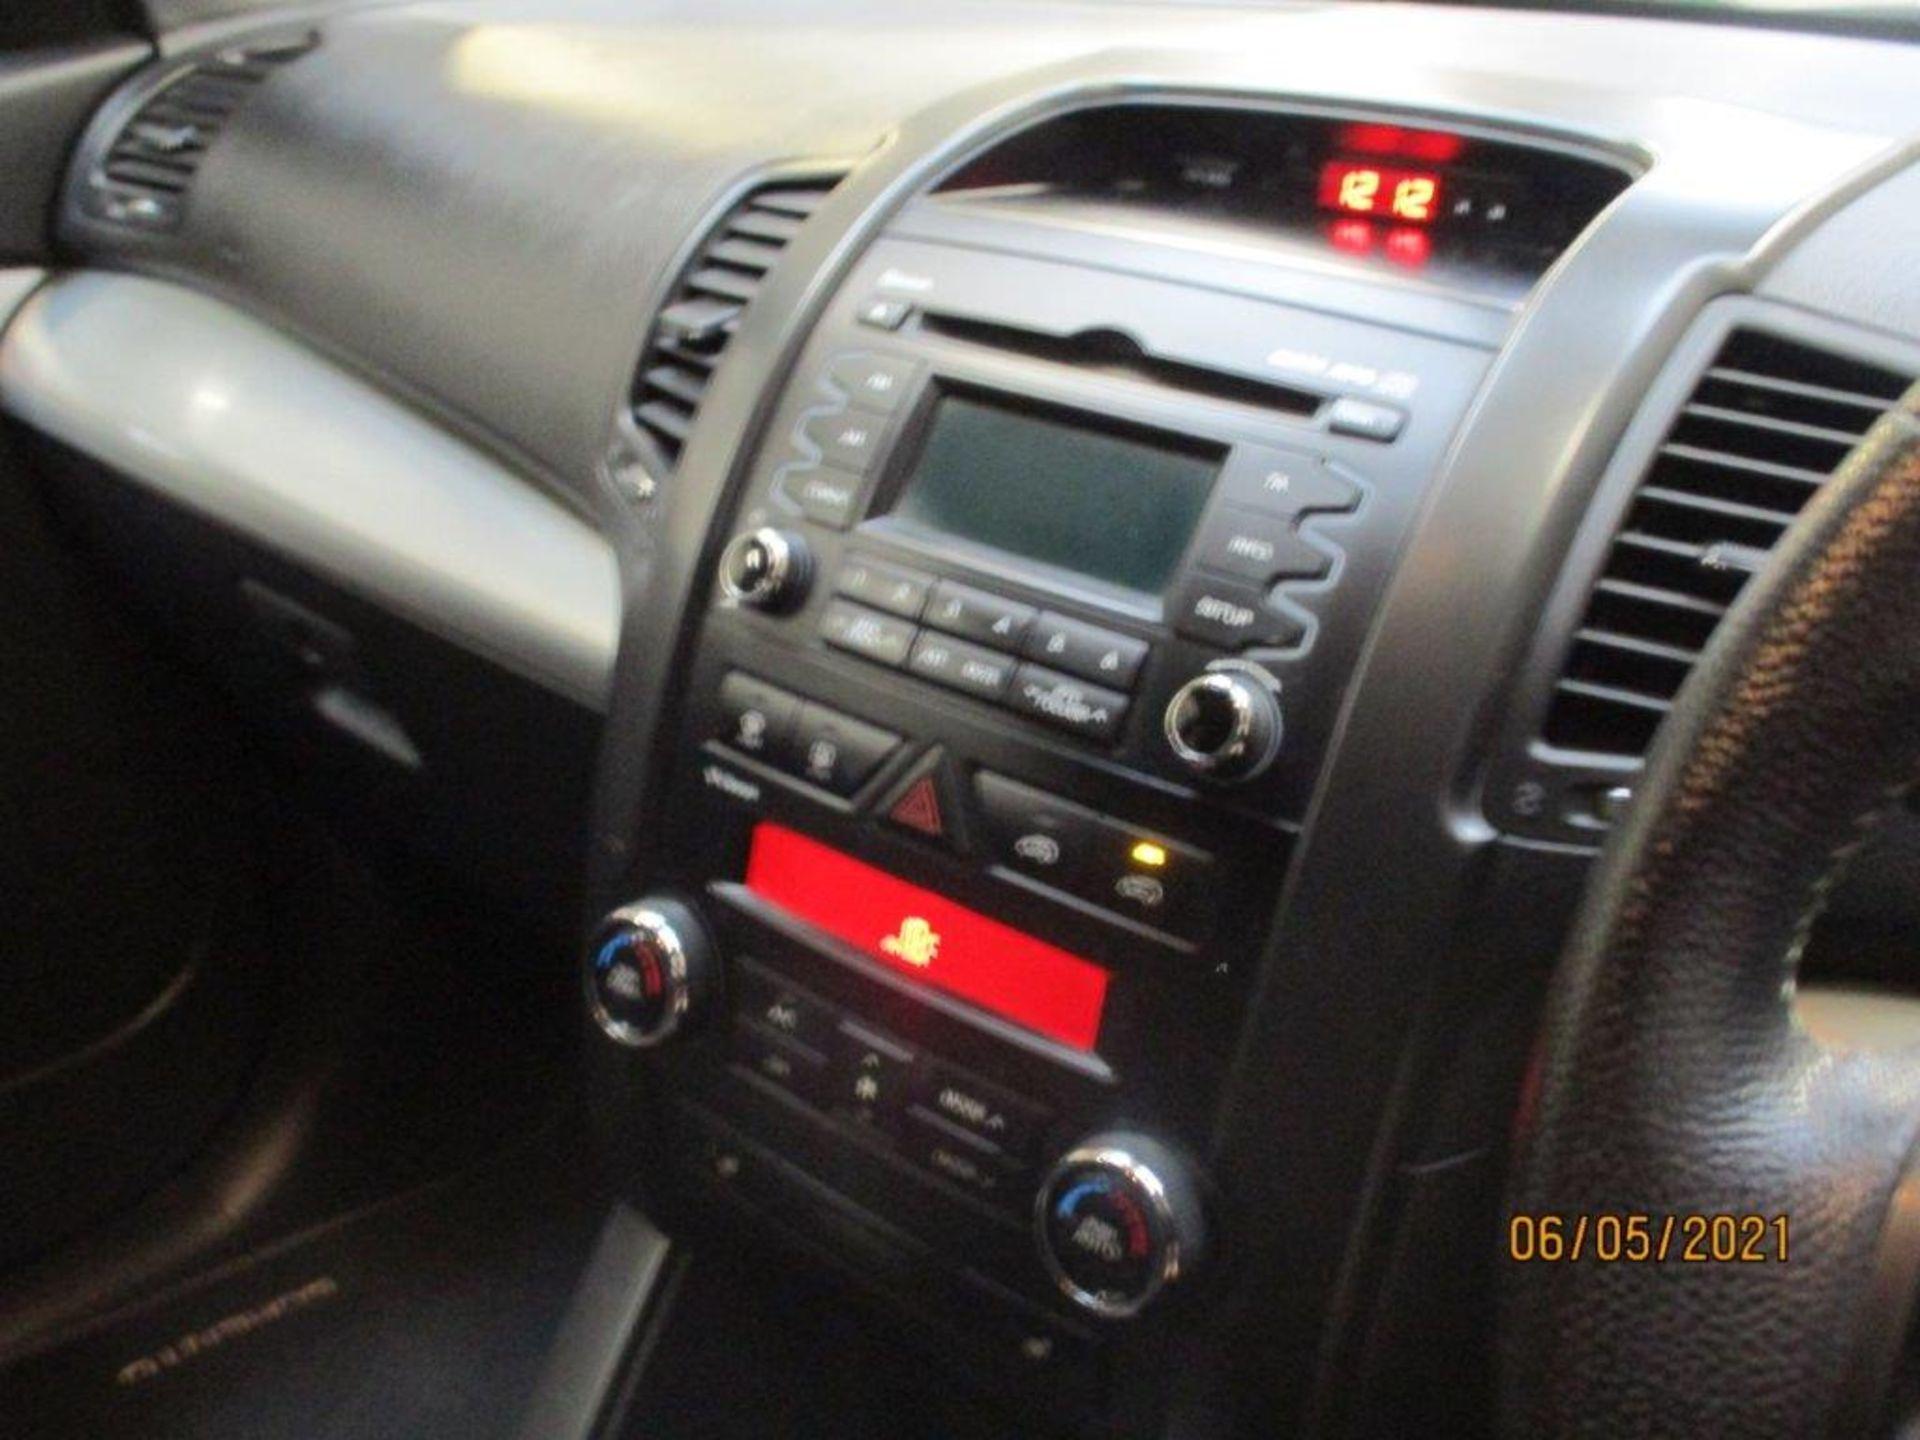 12 12 Kia Sorento KX2 CRDI Auto - Image 9 of 24